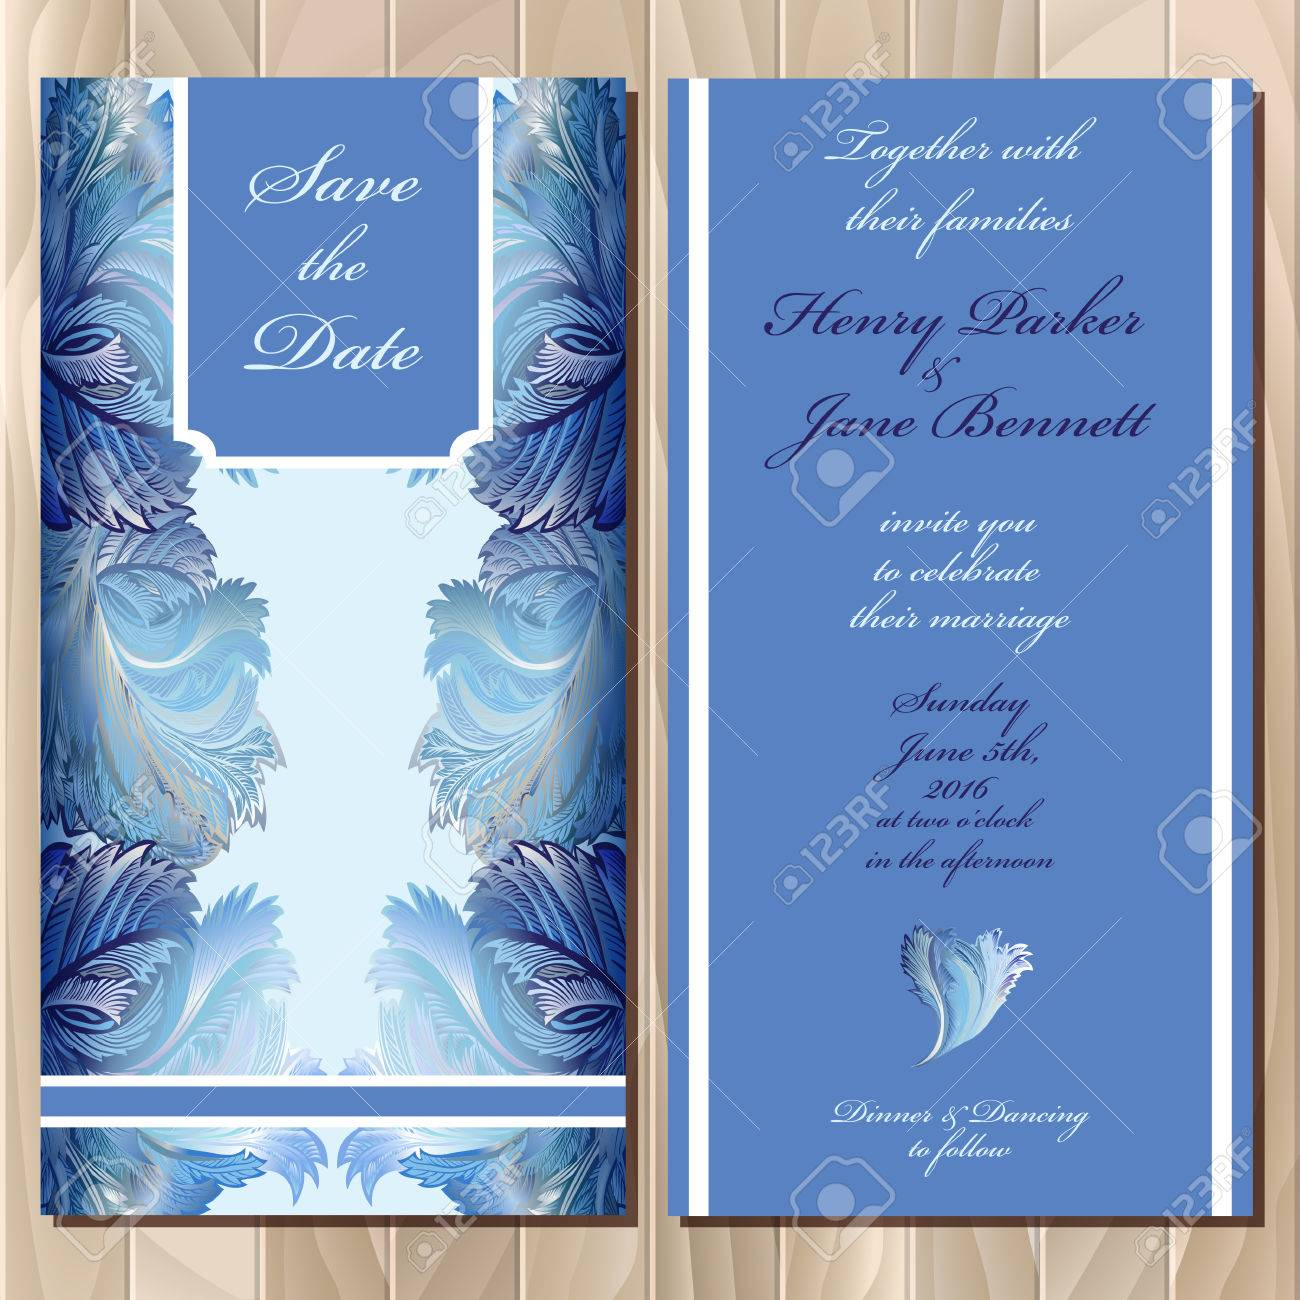 Winter Frozen Glass Design Set Printable Backgrounds Wedding Invitation Card Blue Design Vector Illustration Royalty Free Cliparts Vectors And Stock Illustration Image 48676584